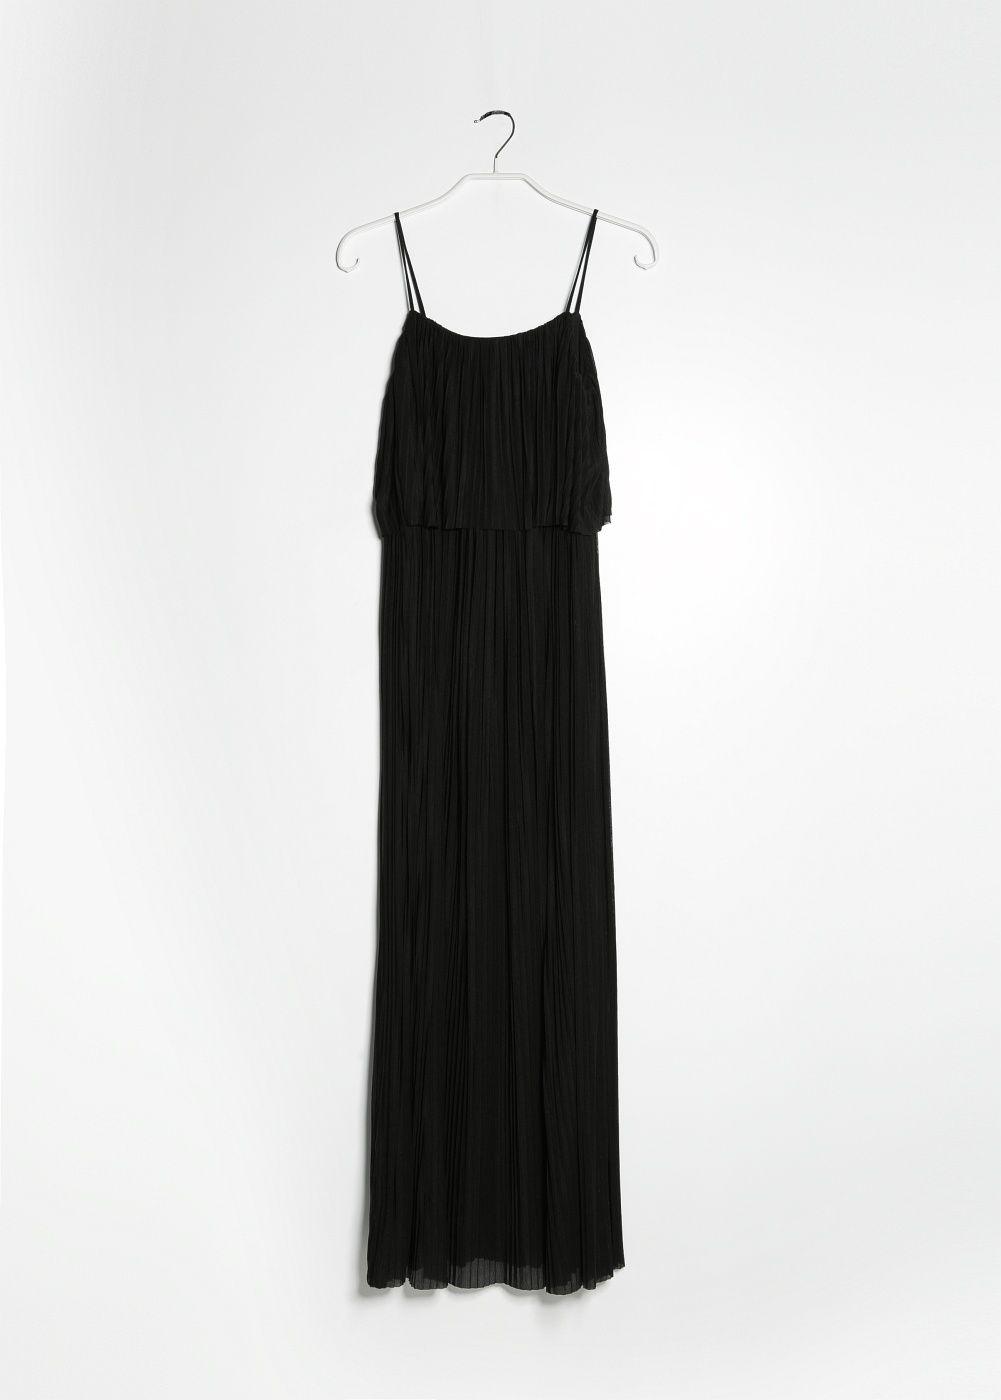 Langes, plissiertes kleid - Damen | Damen lange kleider ...